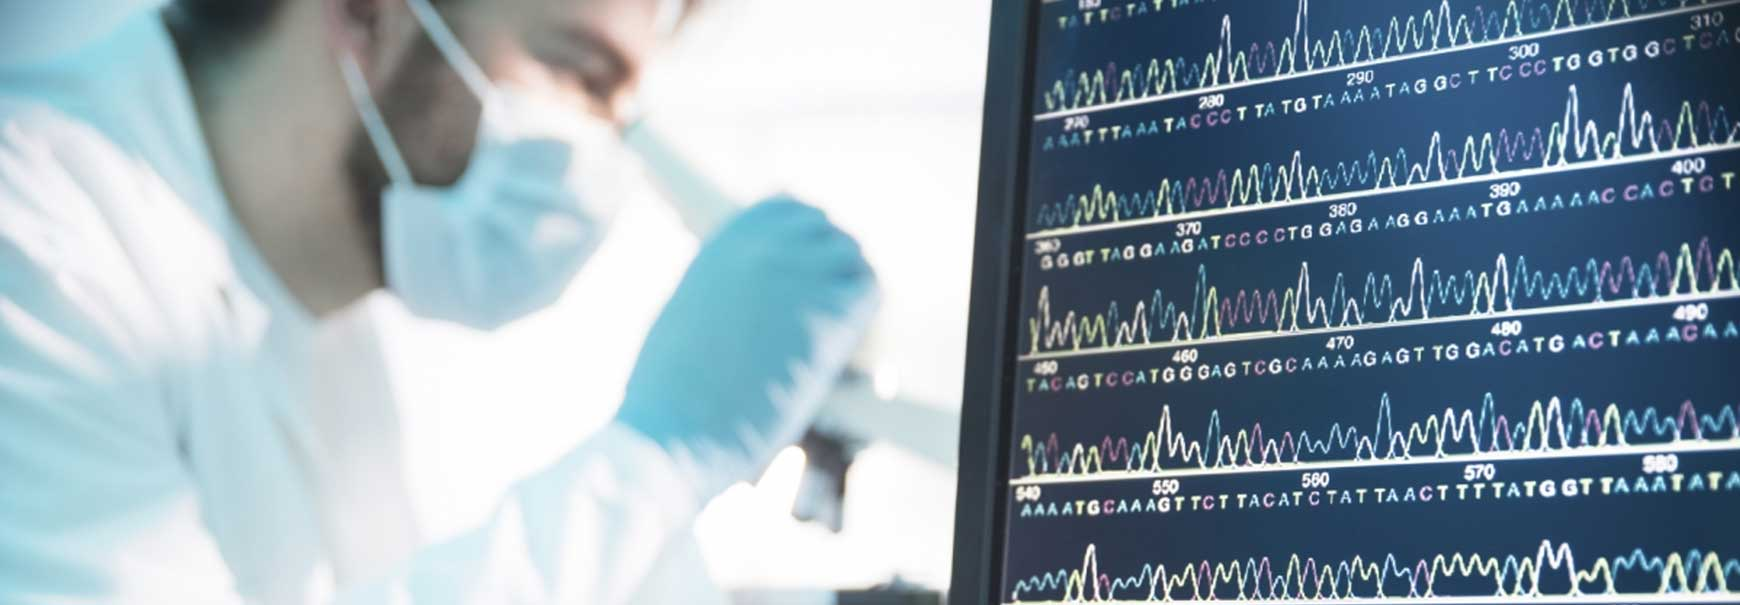 Persometrics DNA testing lab